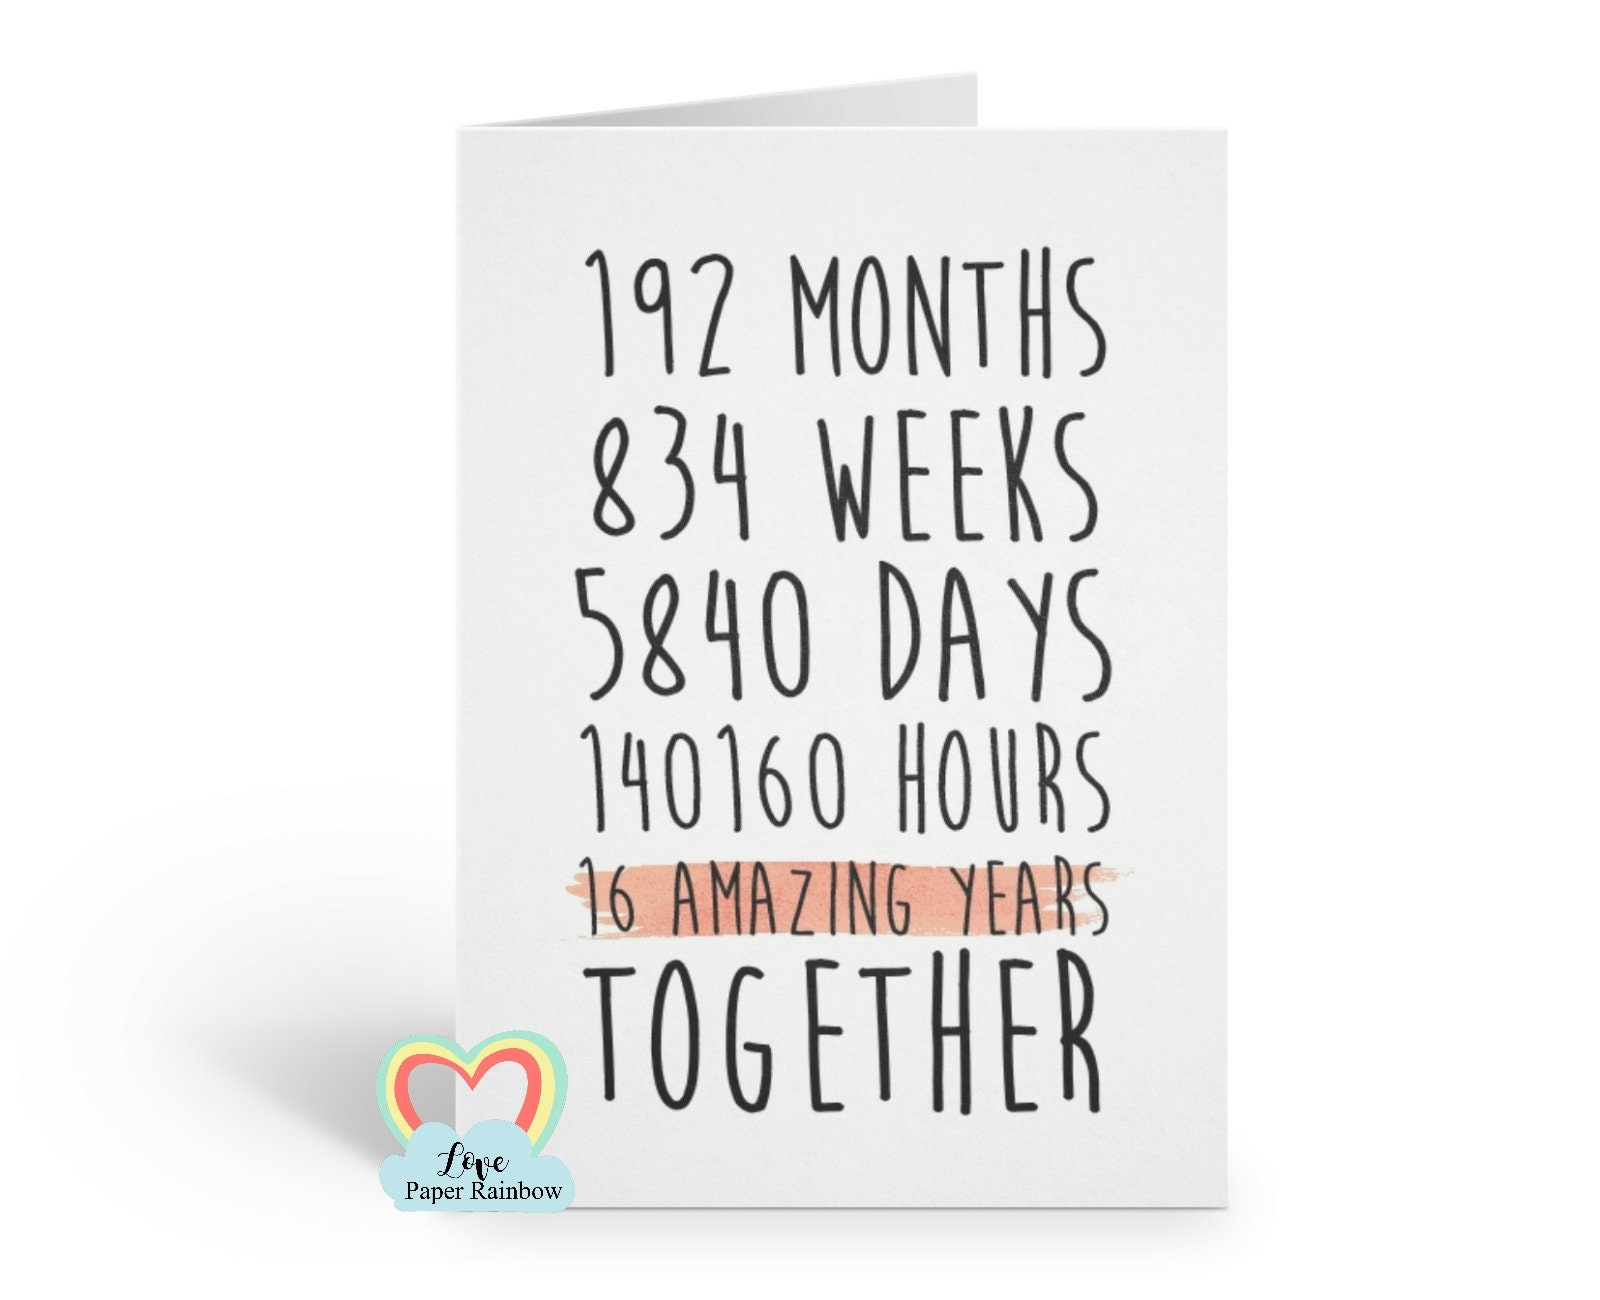 16th Wedding Anniversary.16th Anniversary Card 16th Wedding Anniversary Card 16 Amazing